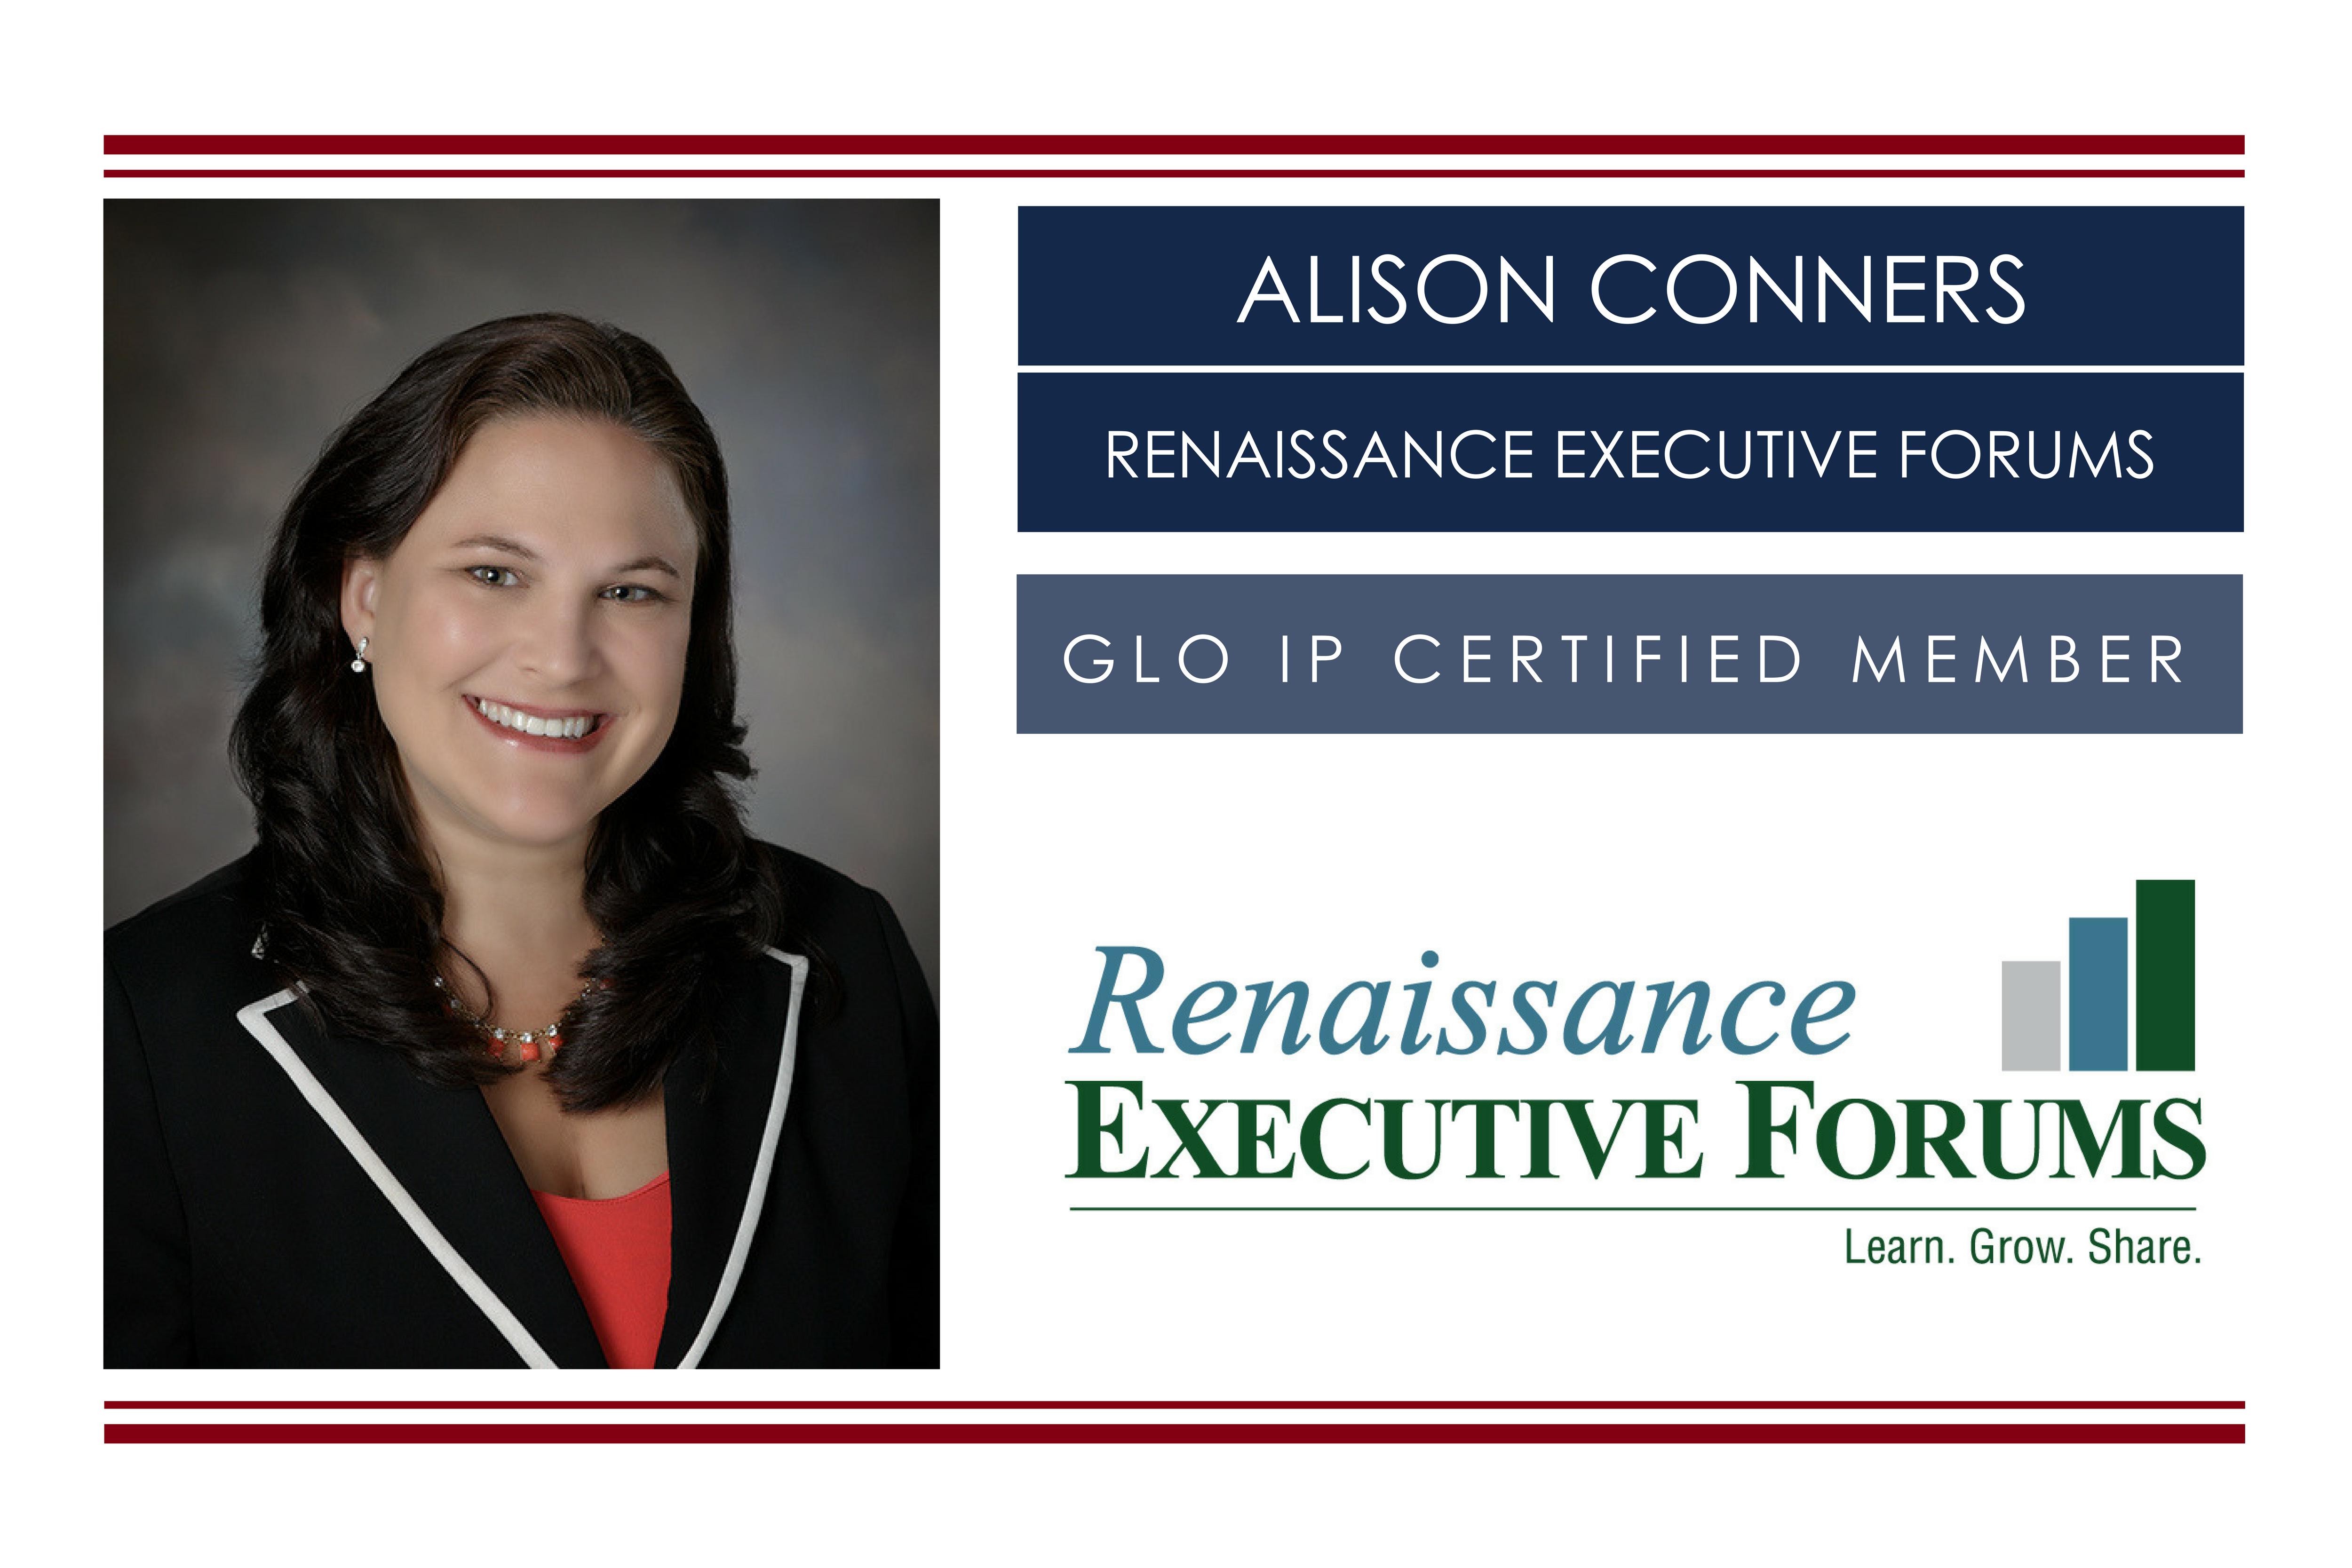 ALISON_GLO IP Certified Member (1)